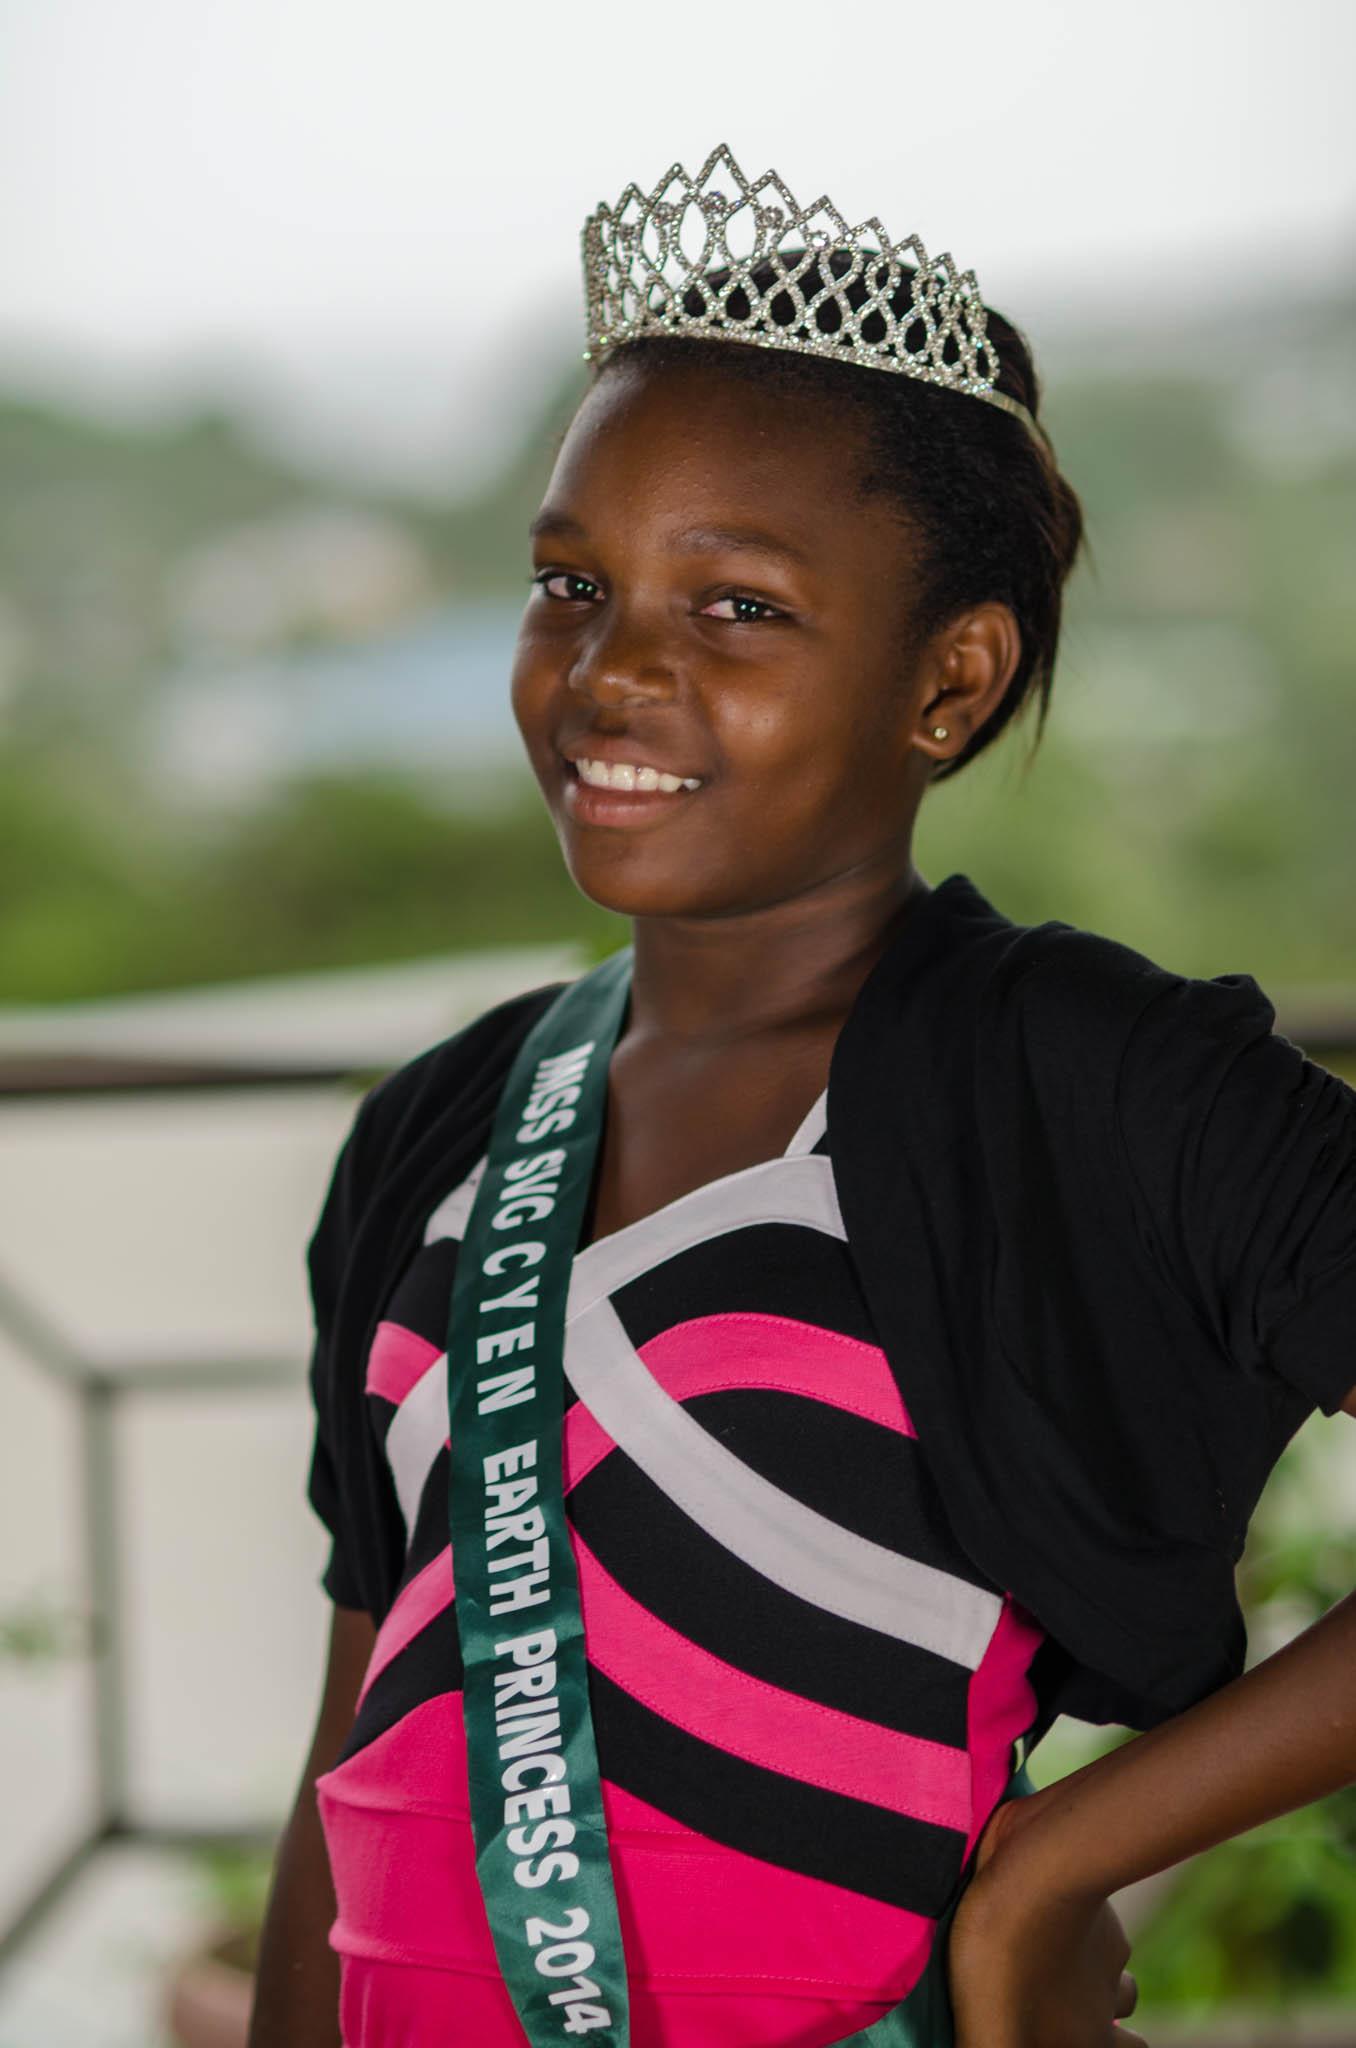 Princess Oricia, Miss SVG CYEN Earth Princess 2014